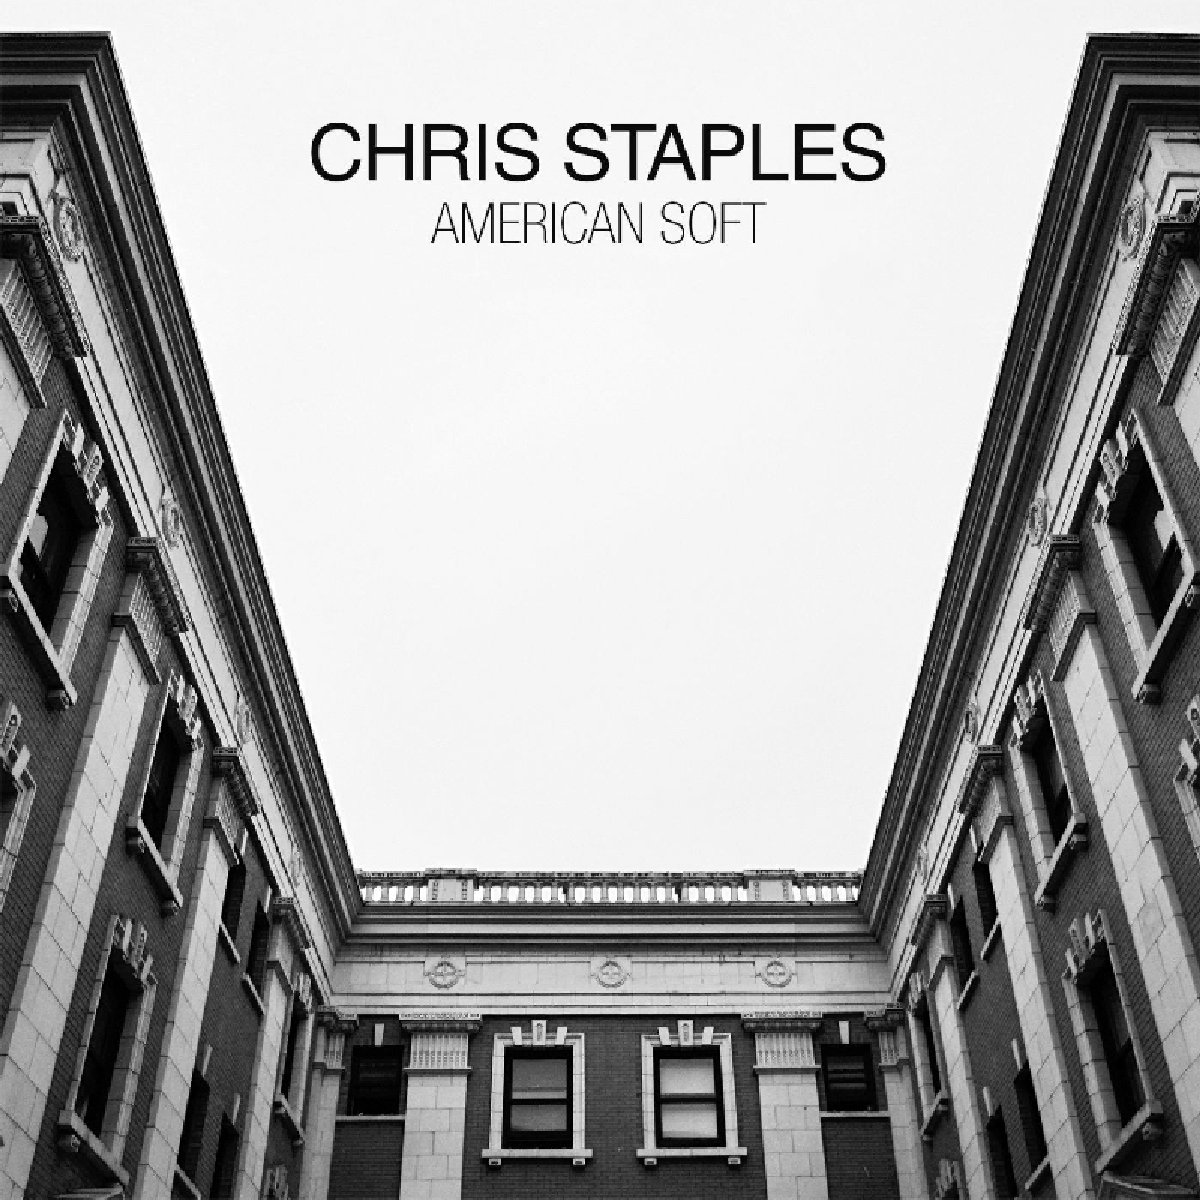 Vinilo : Chris Staples - American Soft (Bonus Tracks, Digital Download Card)